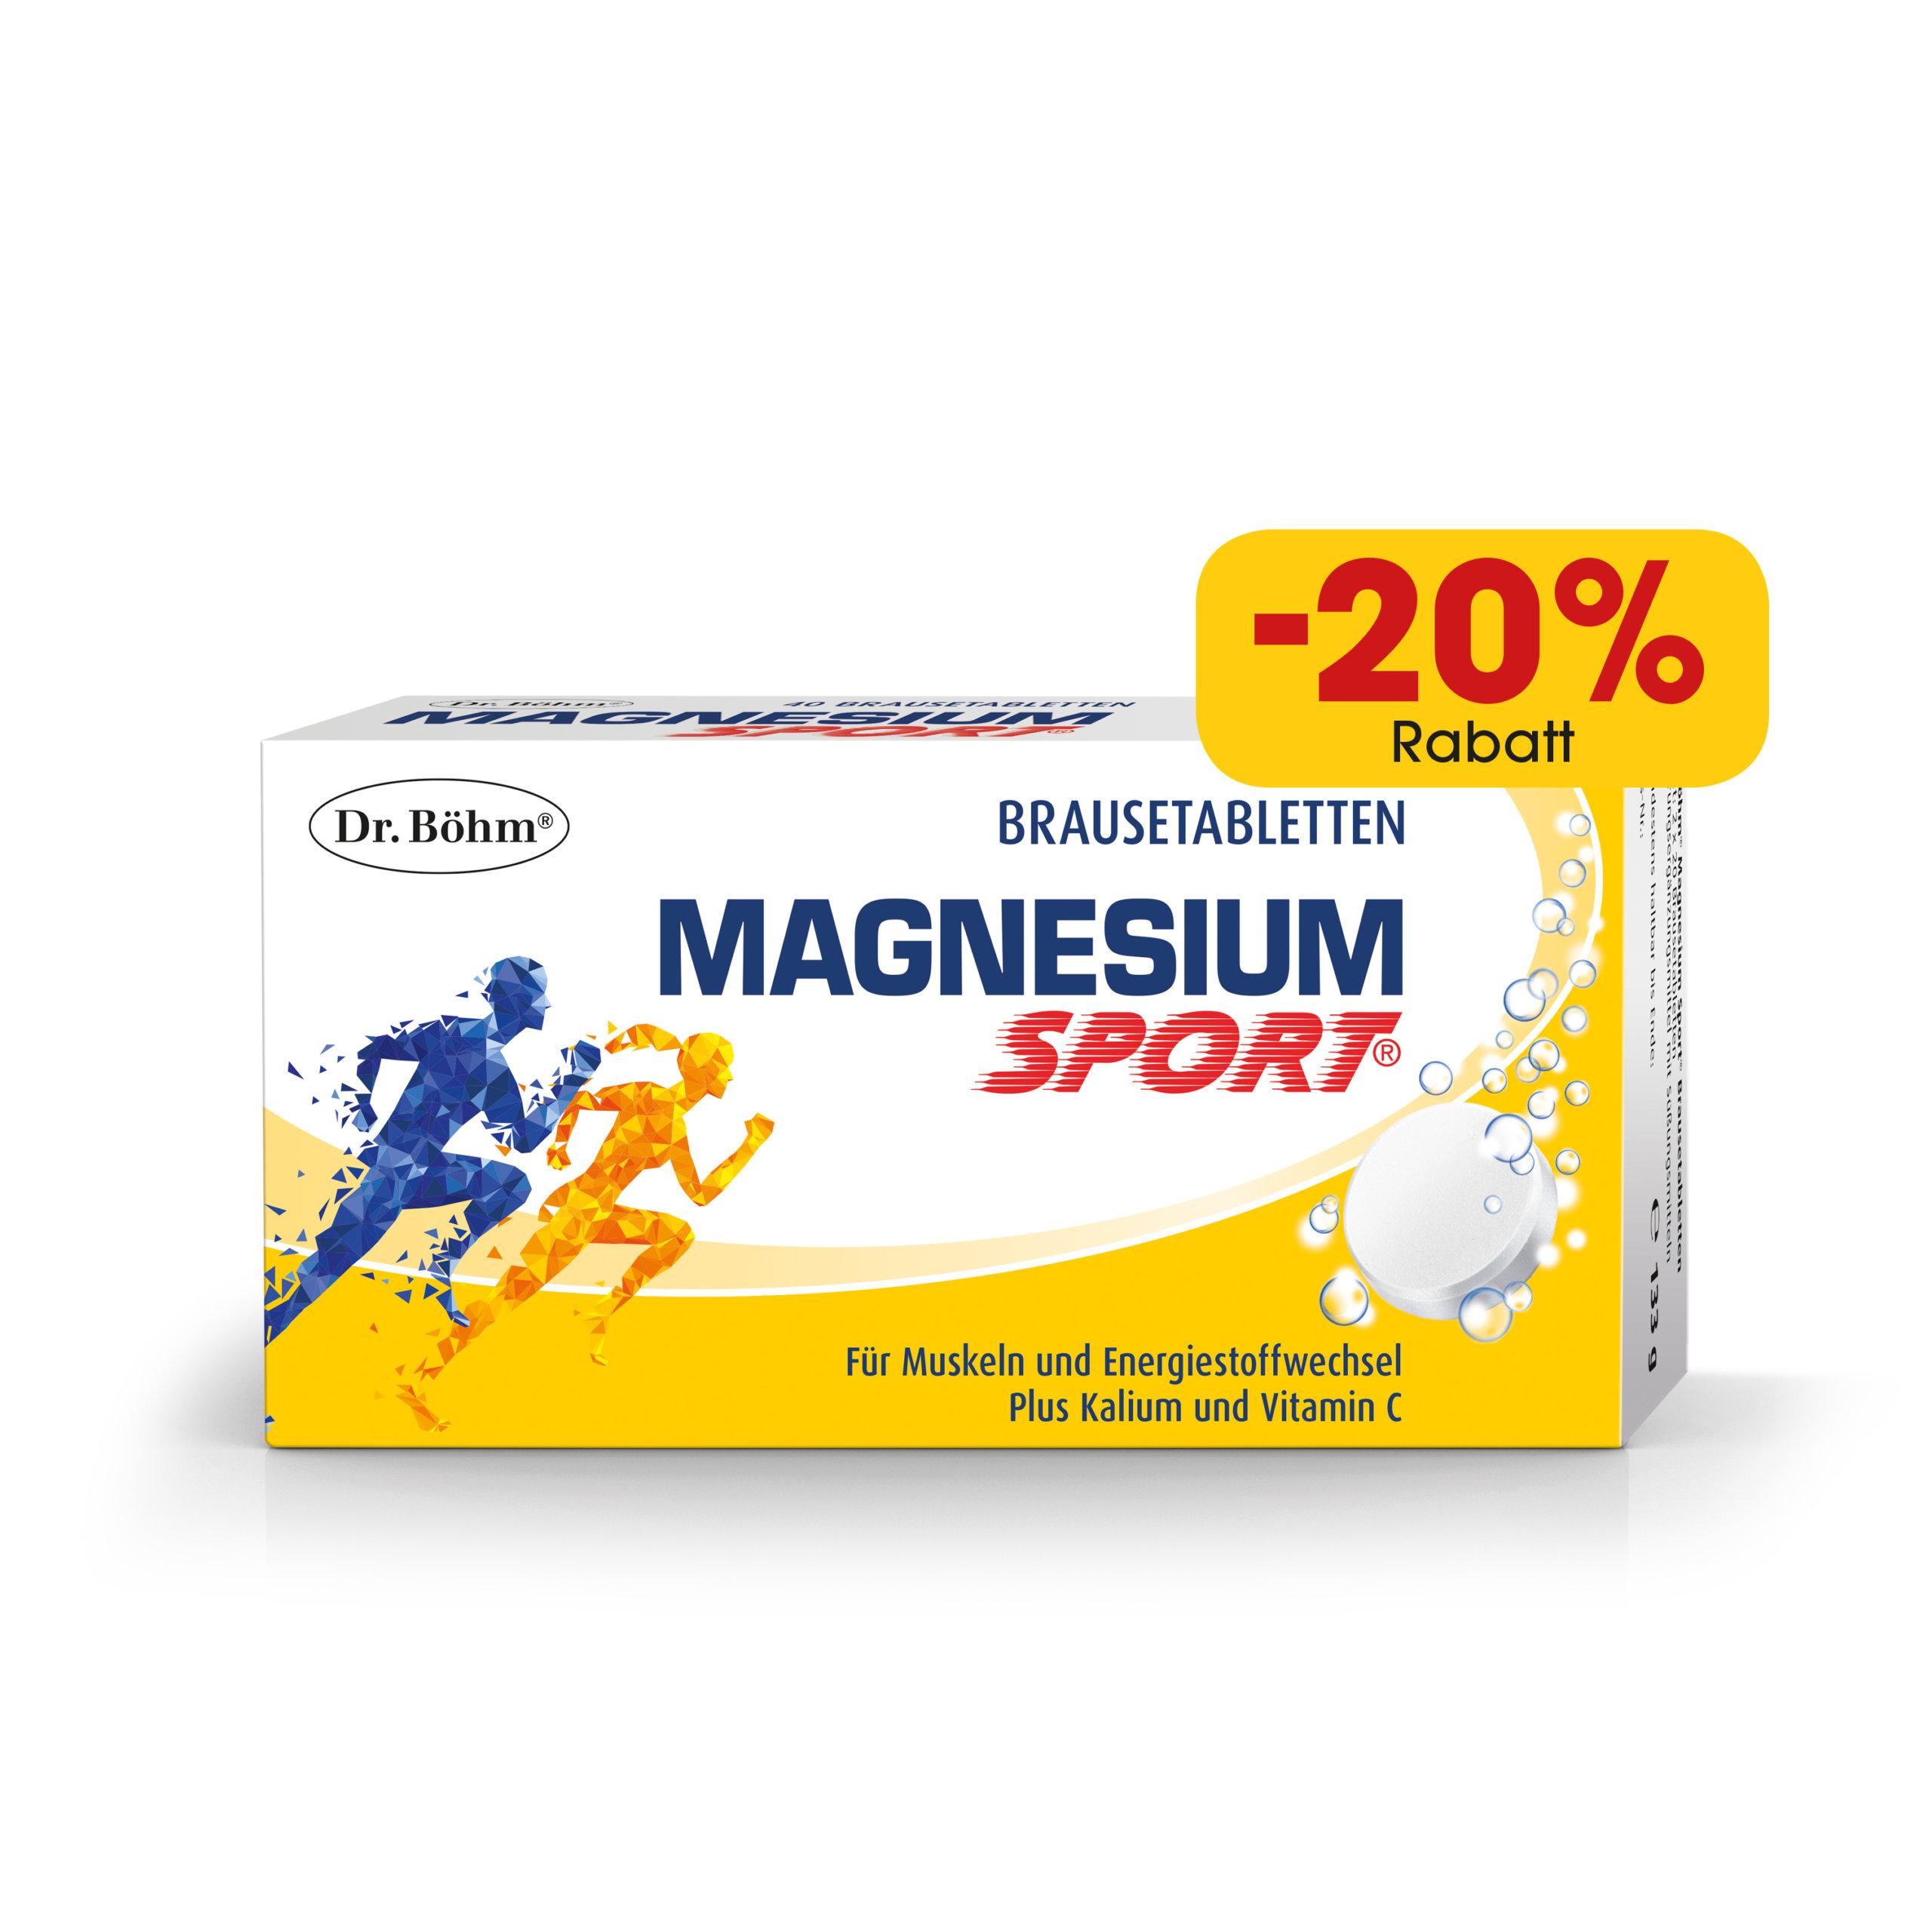 Dr. Böhm® Magnesium Sport® Brausetabletten